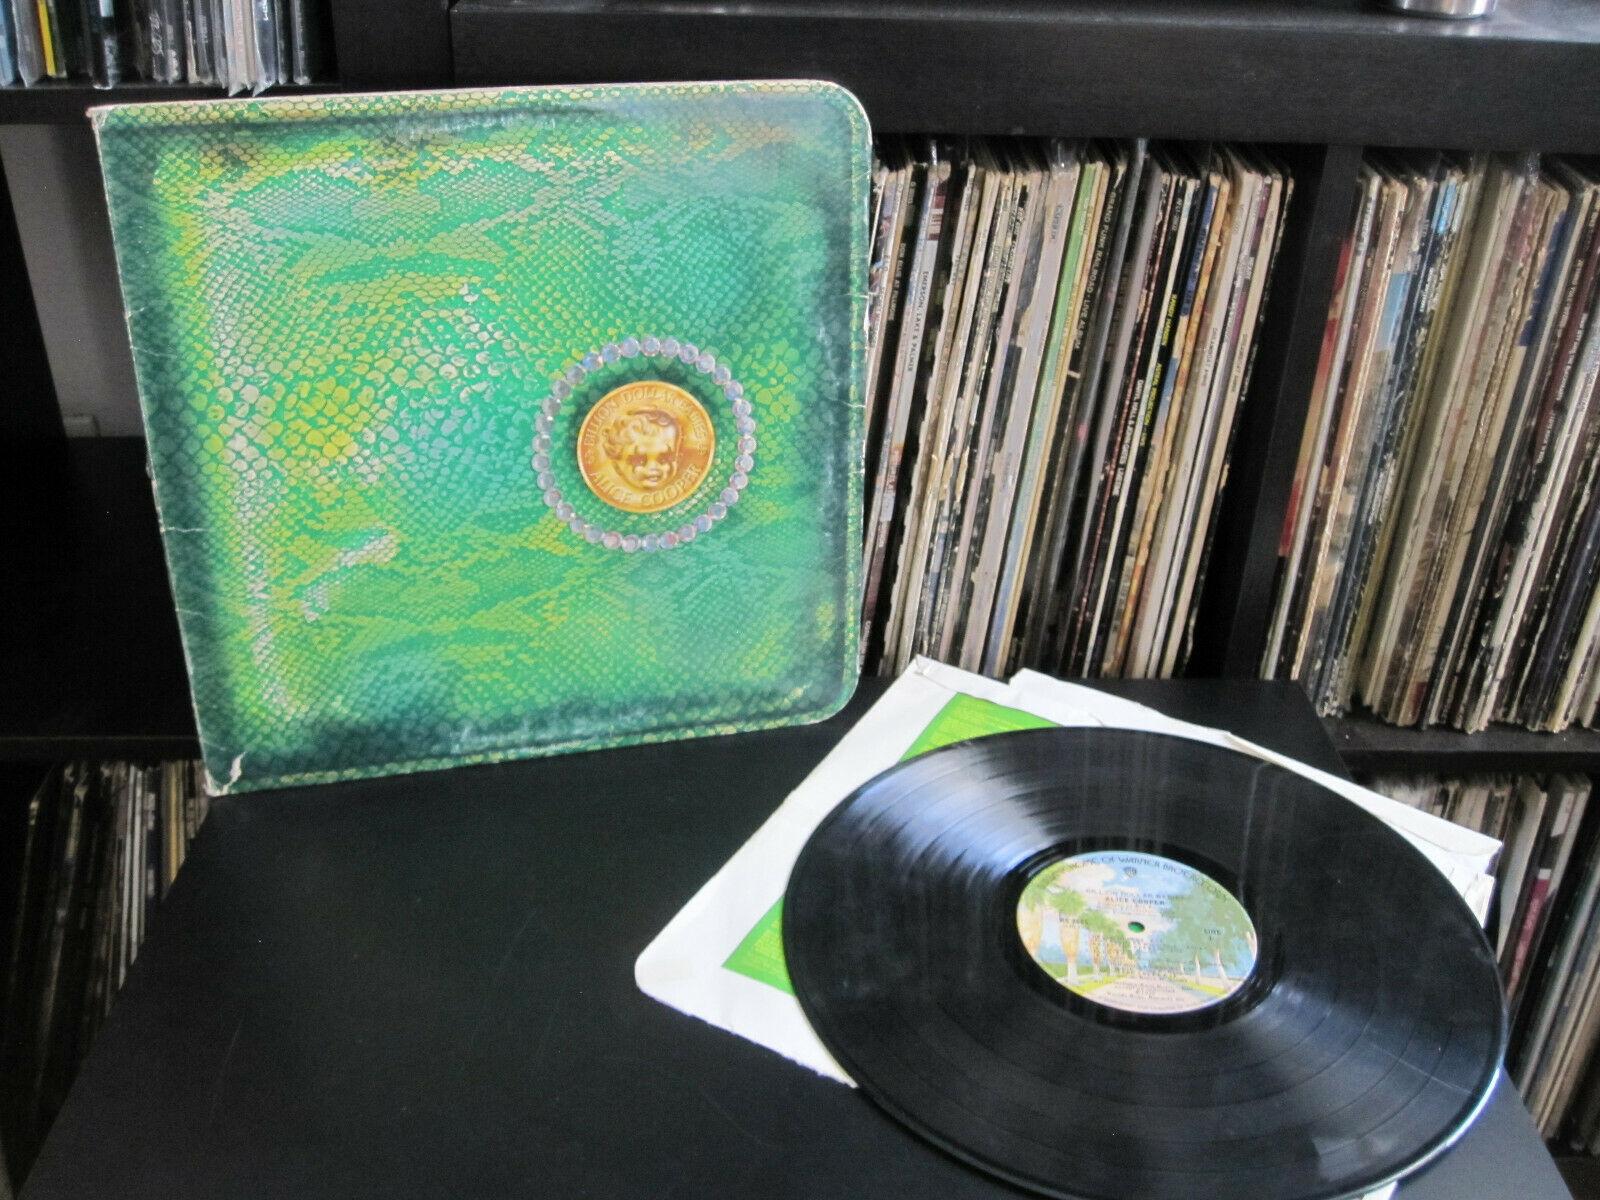 Alice Cooper ?– Billion Dollar Babies 1973 WB BS 2685 LP Rock Record G+/G+